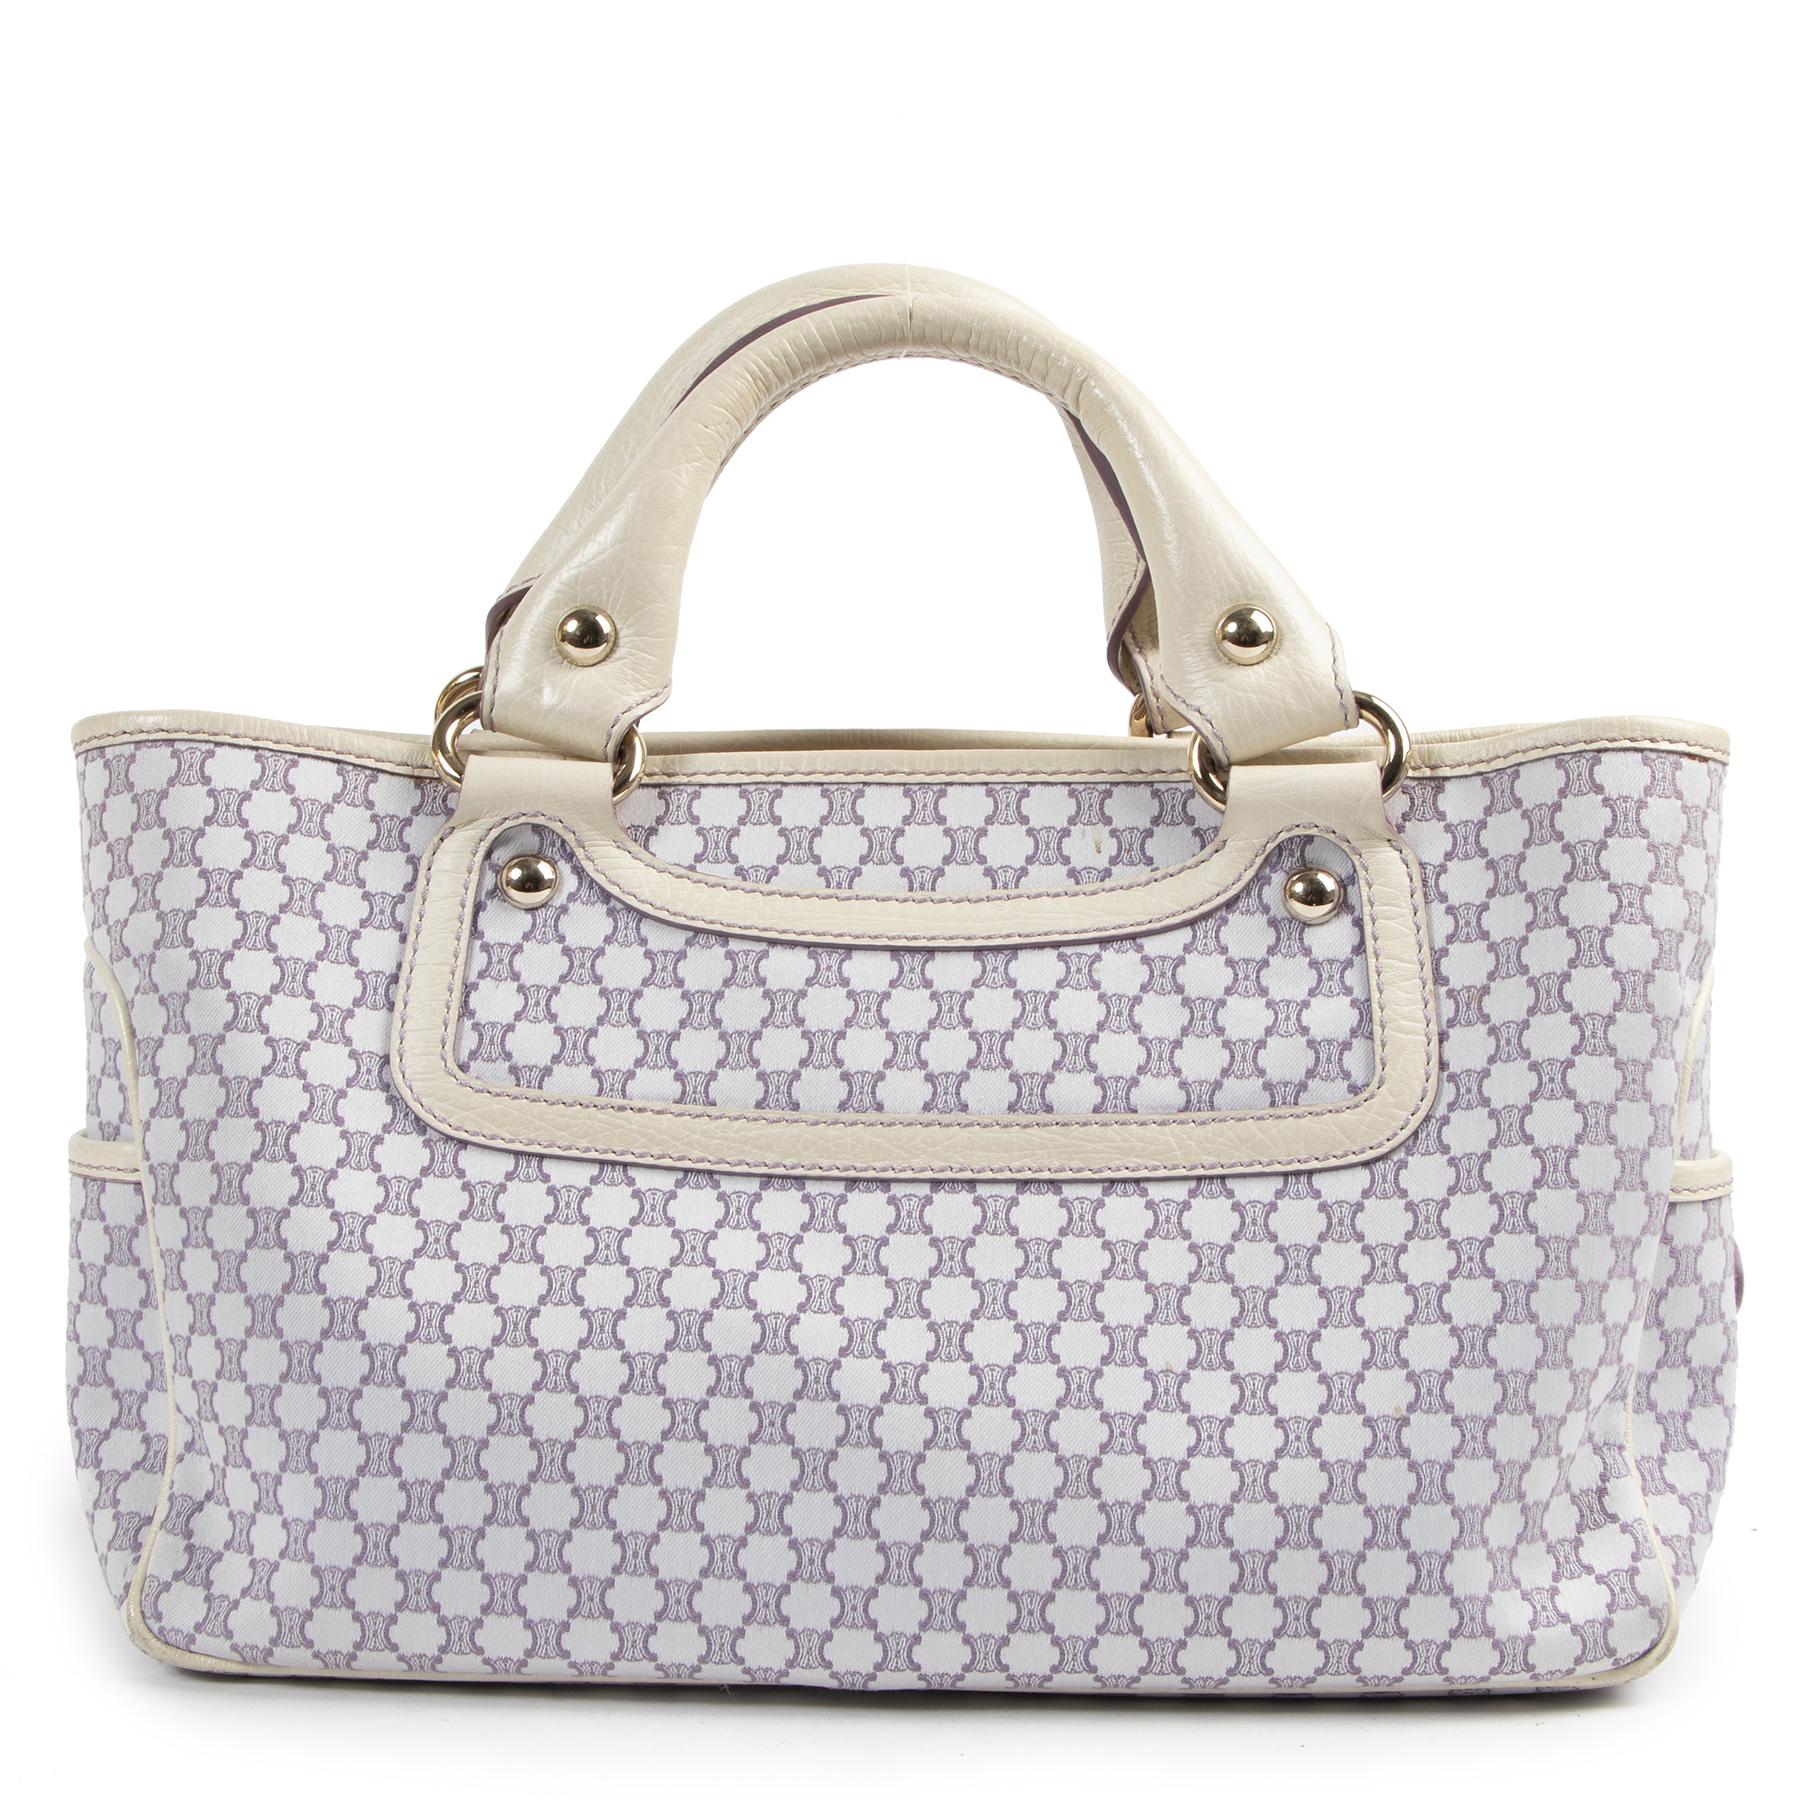 Authentic secondhand Celine bags luxury vintage designer brands webshop LabelLOV safe secure online shopping